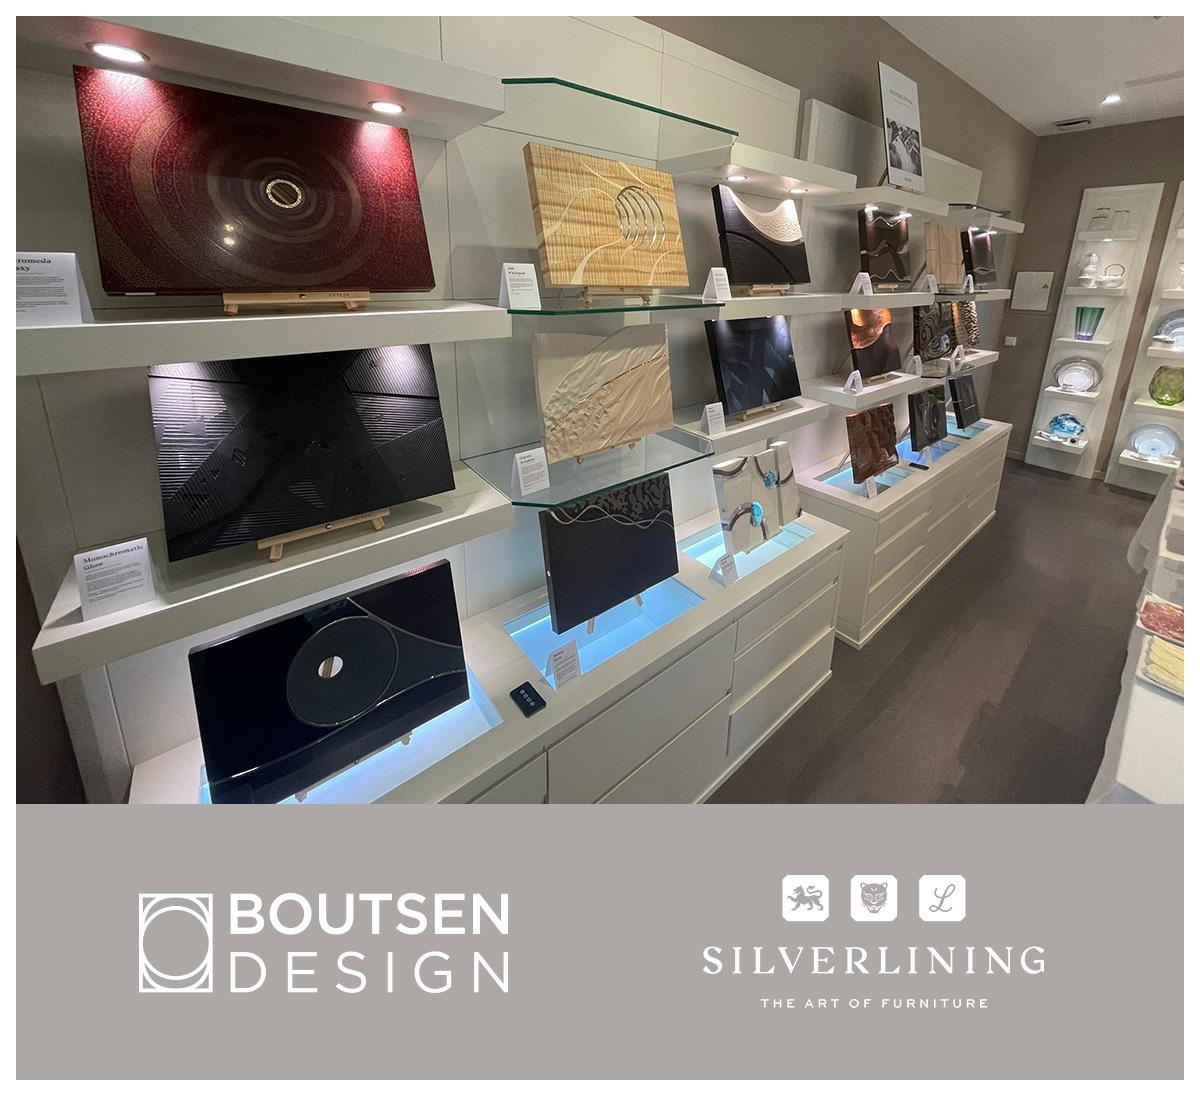 Silverlining Furniture Boutsen Design Showroom Cover Image 1